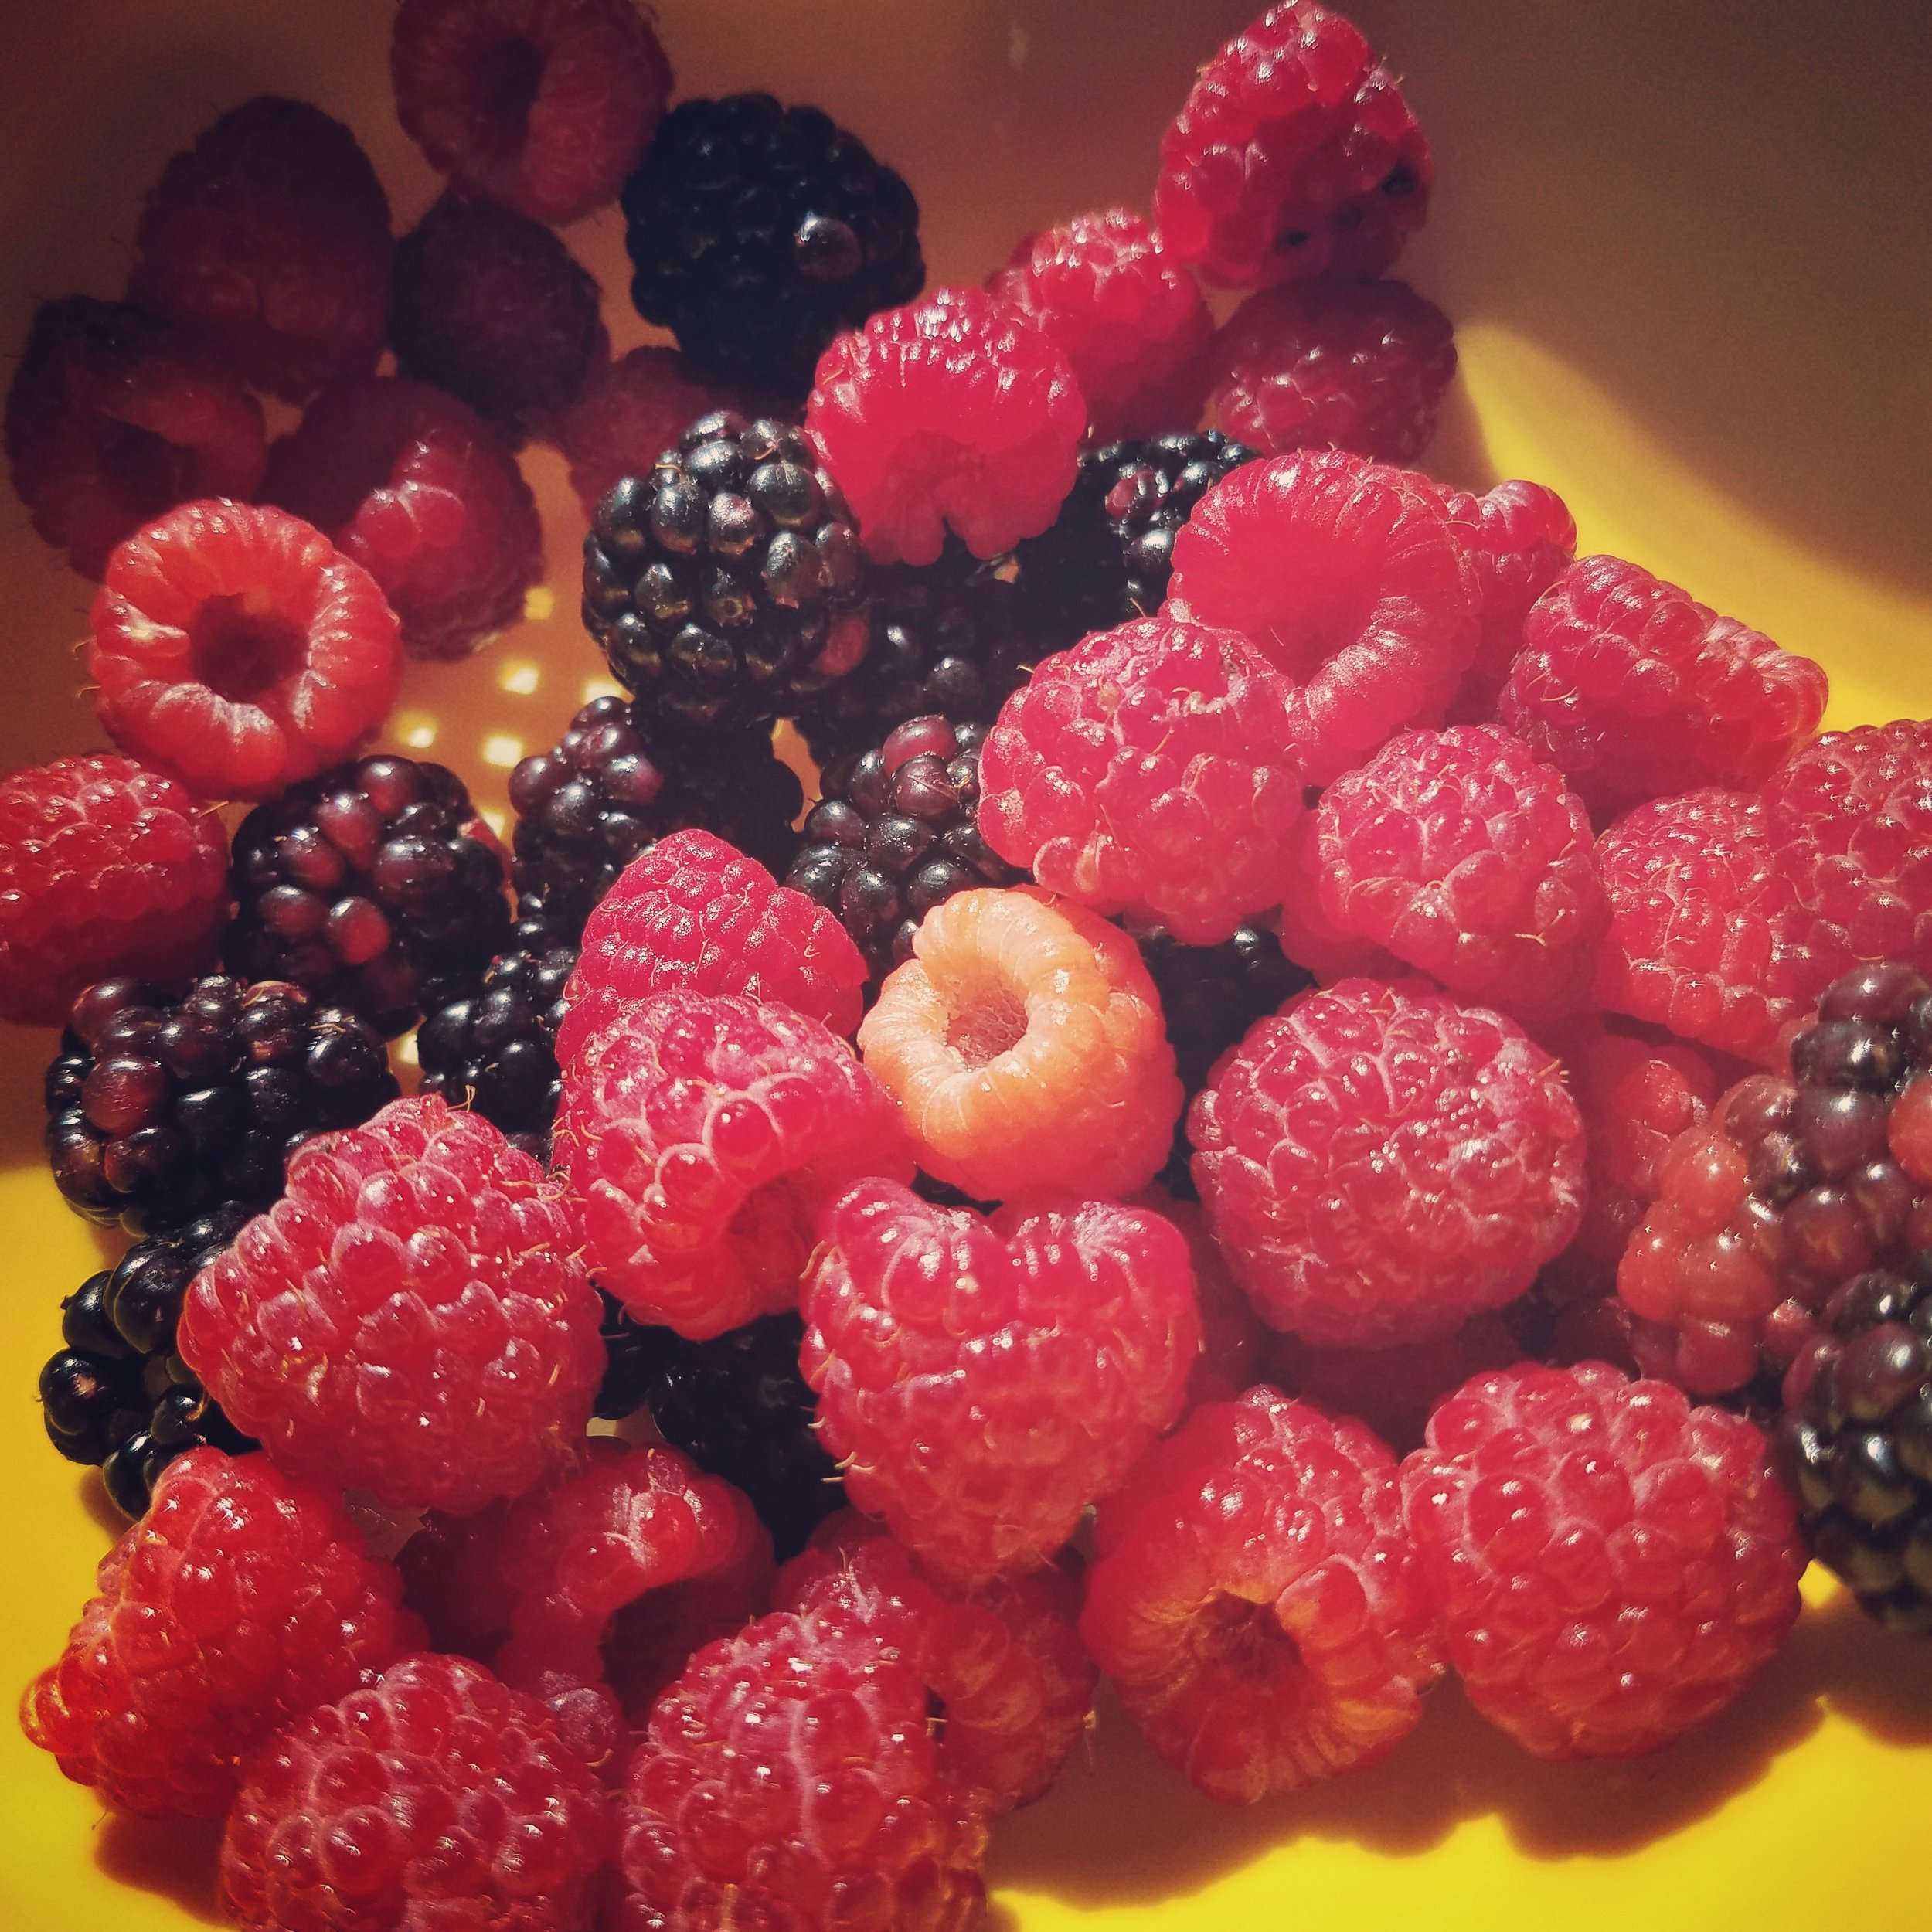 Raspberries from Farm.jpg